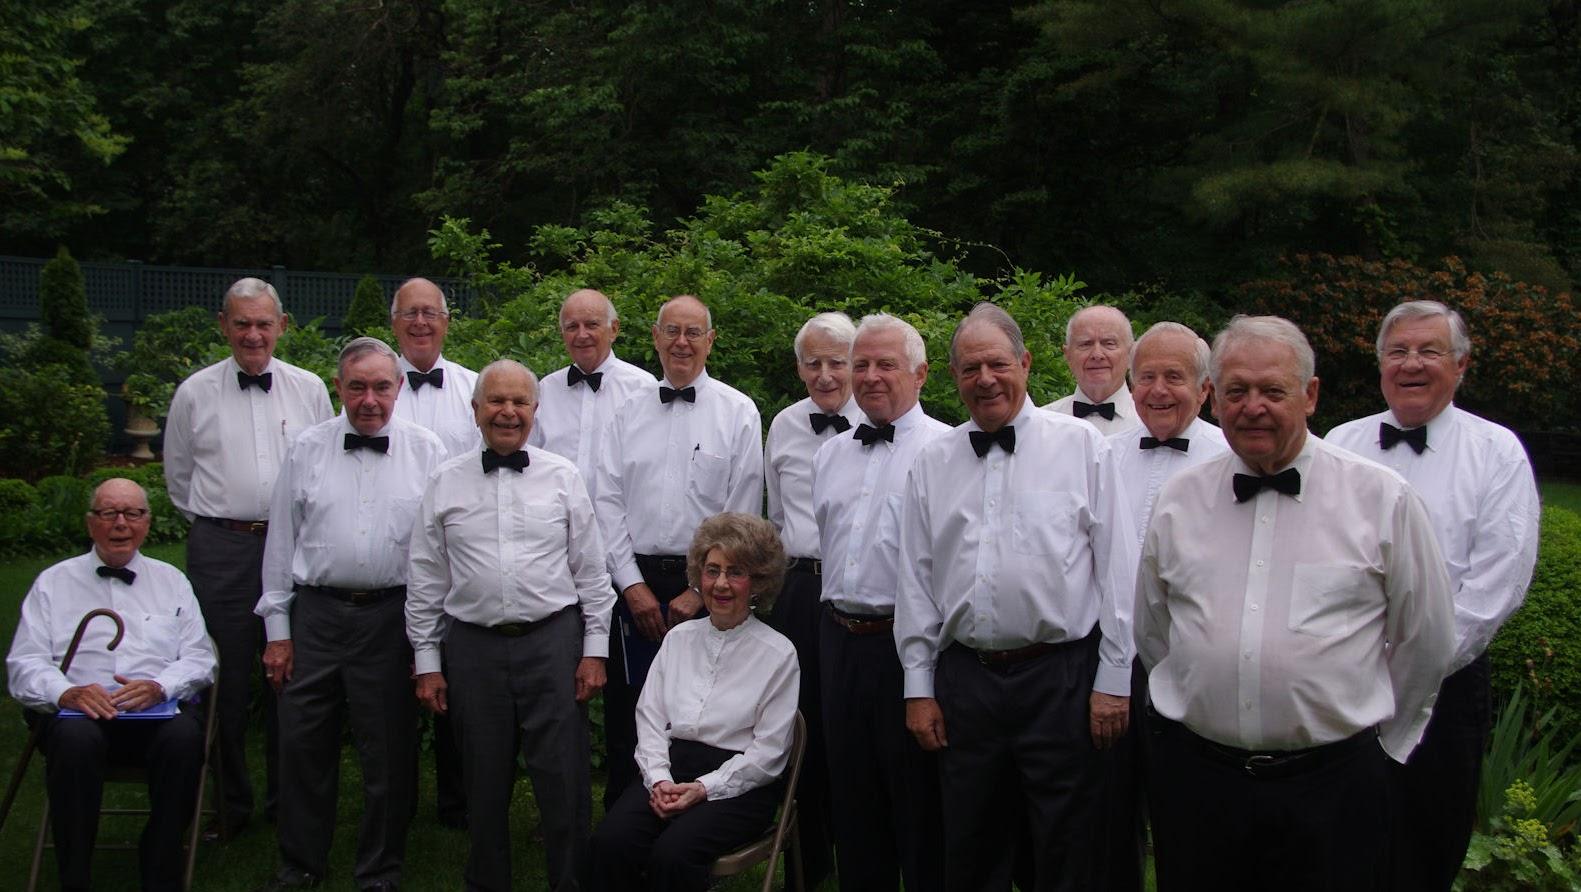 Darien Senior Songsters